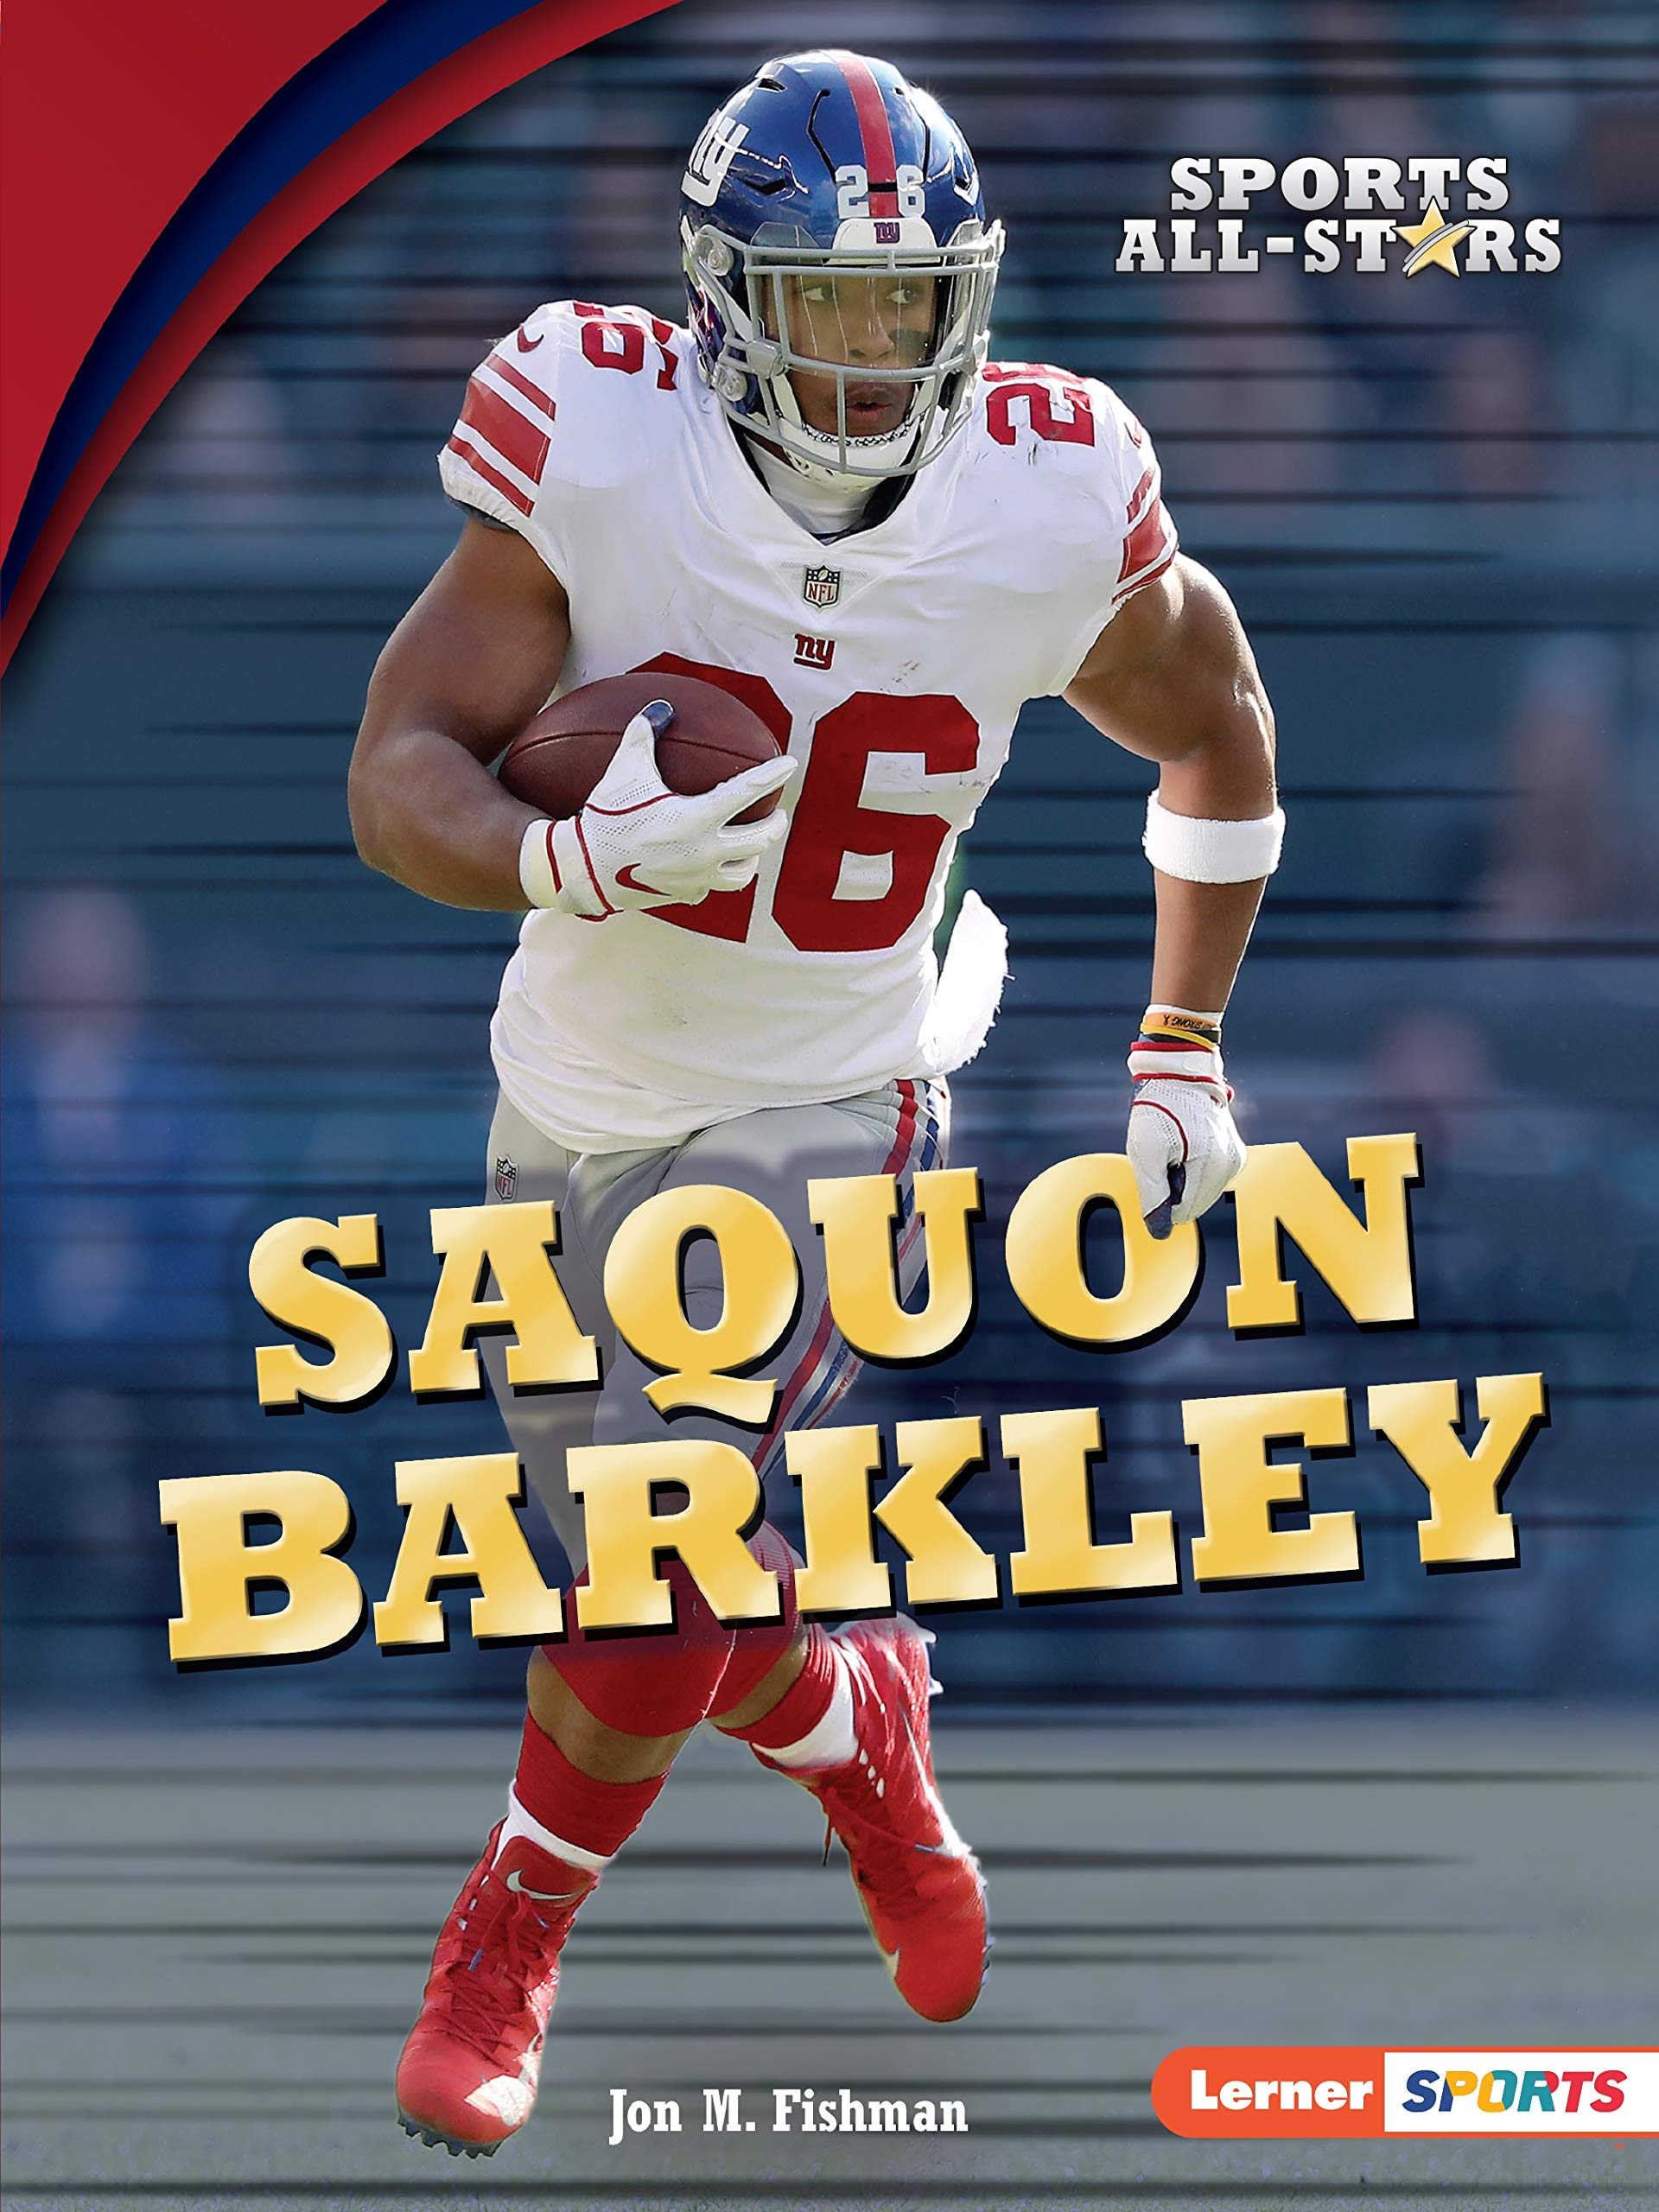 who will replace saquon barkley